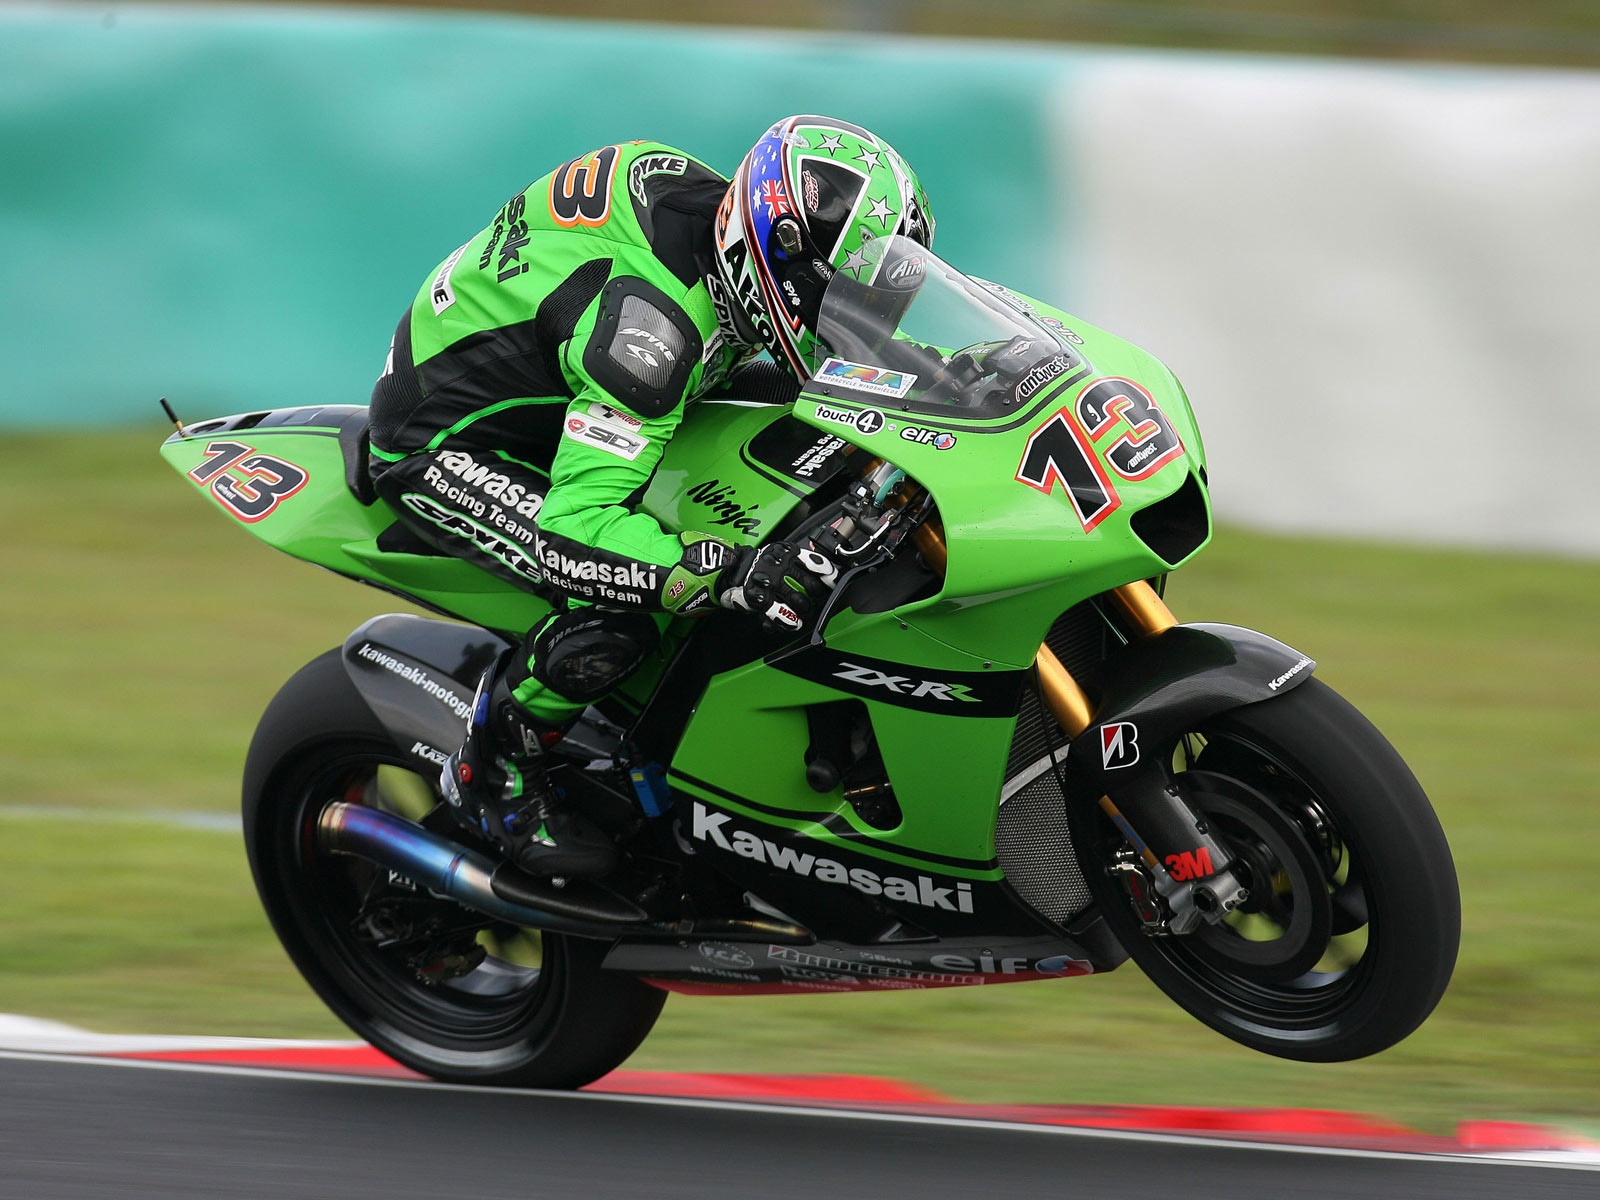 Download HQ acceleration MotoGP Wallpaper Num 27 1600 x 1200 1600x1200